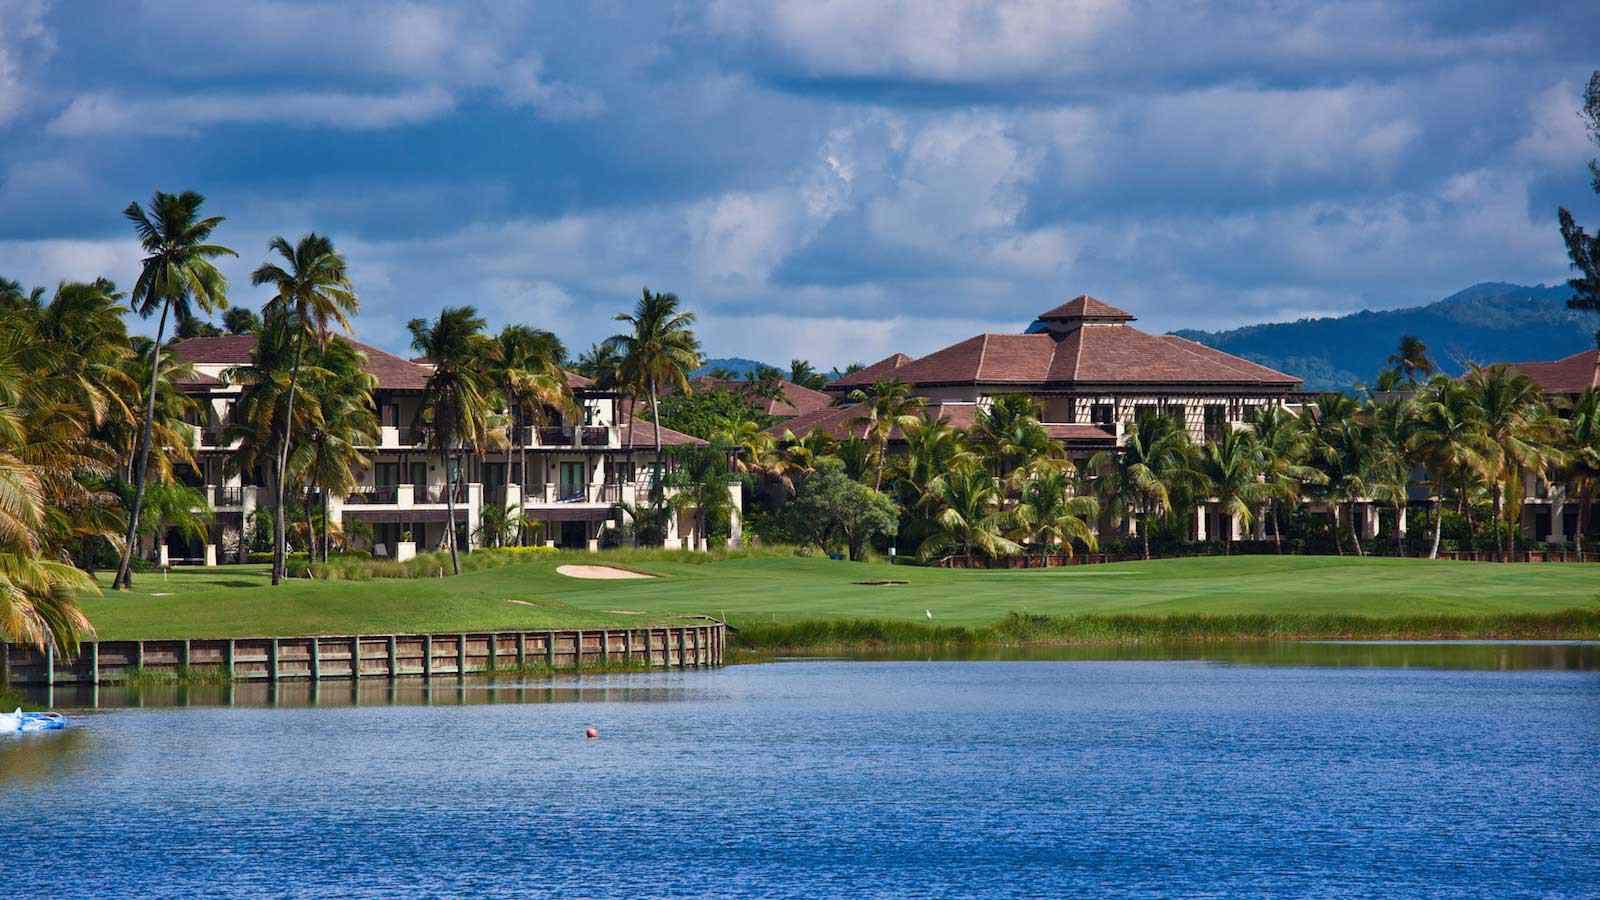 Bahia Beach Resort and Golf Club